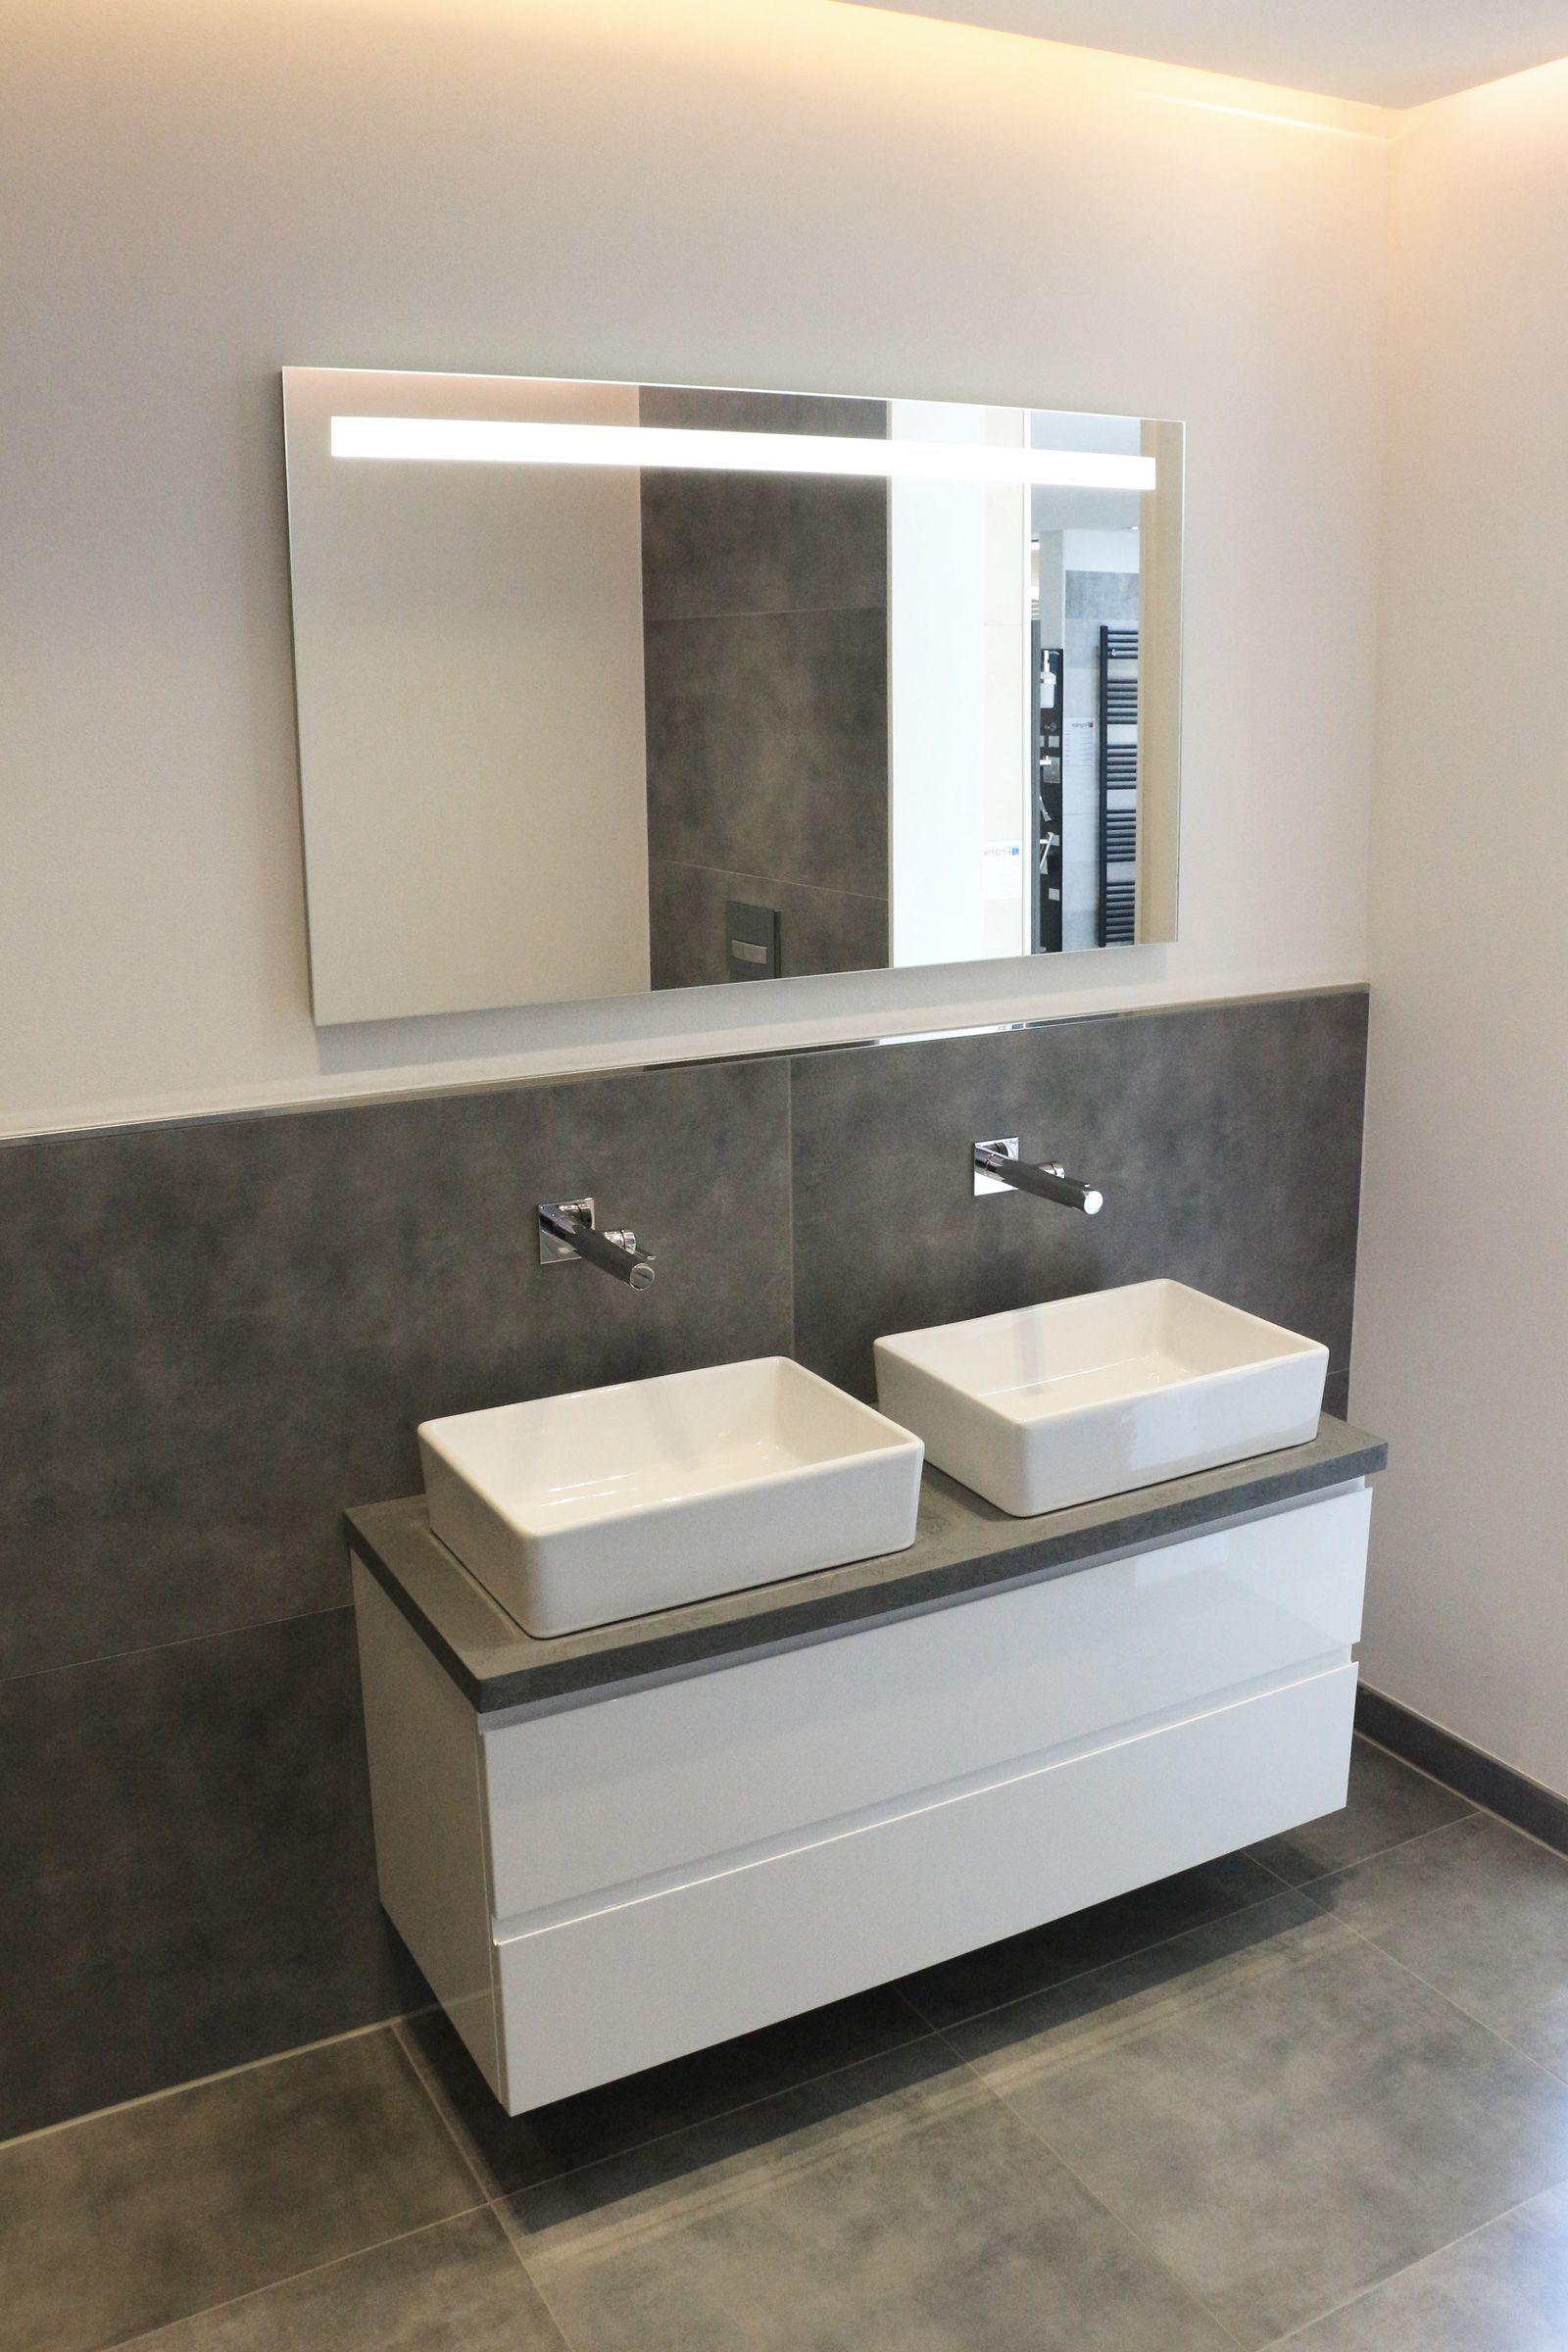 Badezimmer Betonoptik In 2020 Badezimmer Badezimmerideen Und Betonfliesen